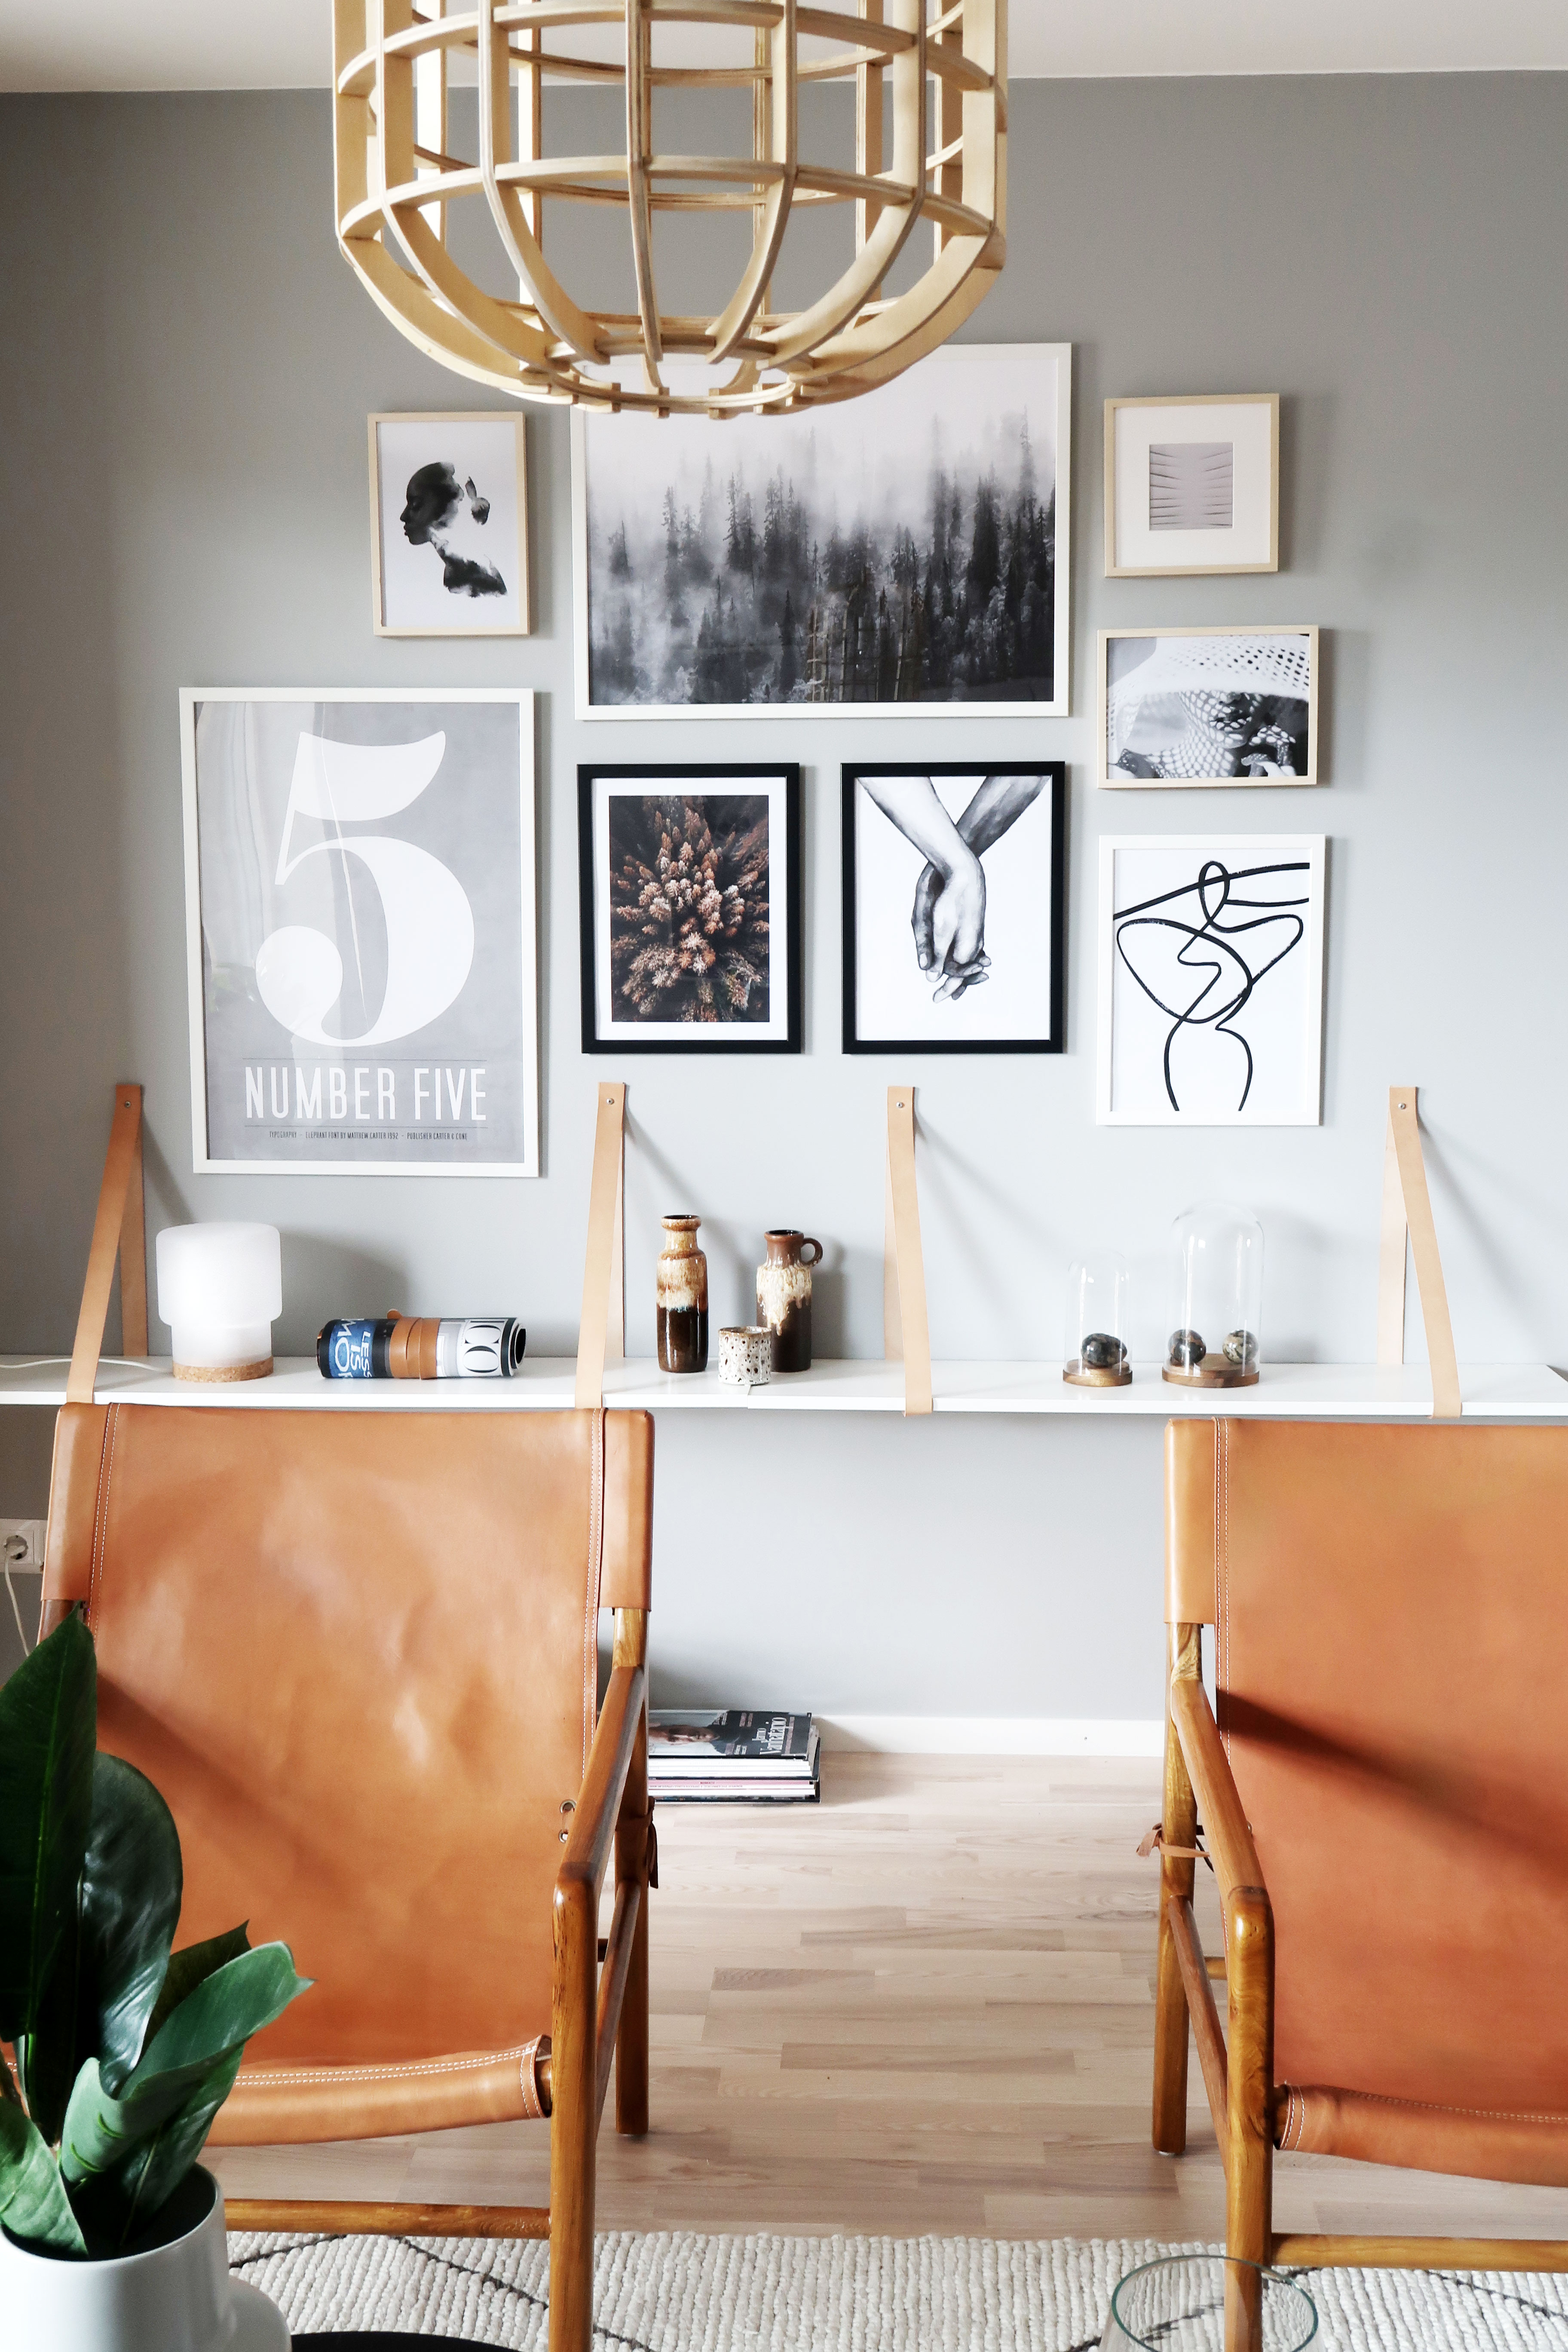 JM-slussen-sovrum-bedroom-interior-7